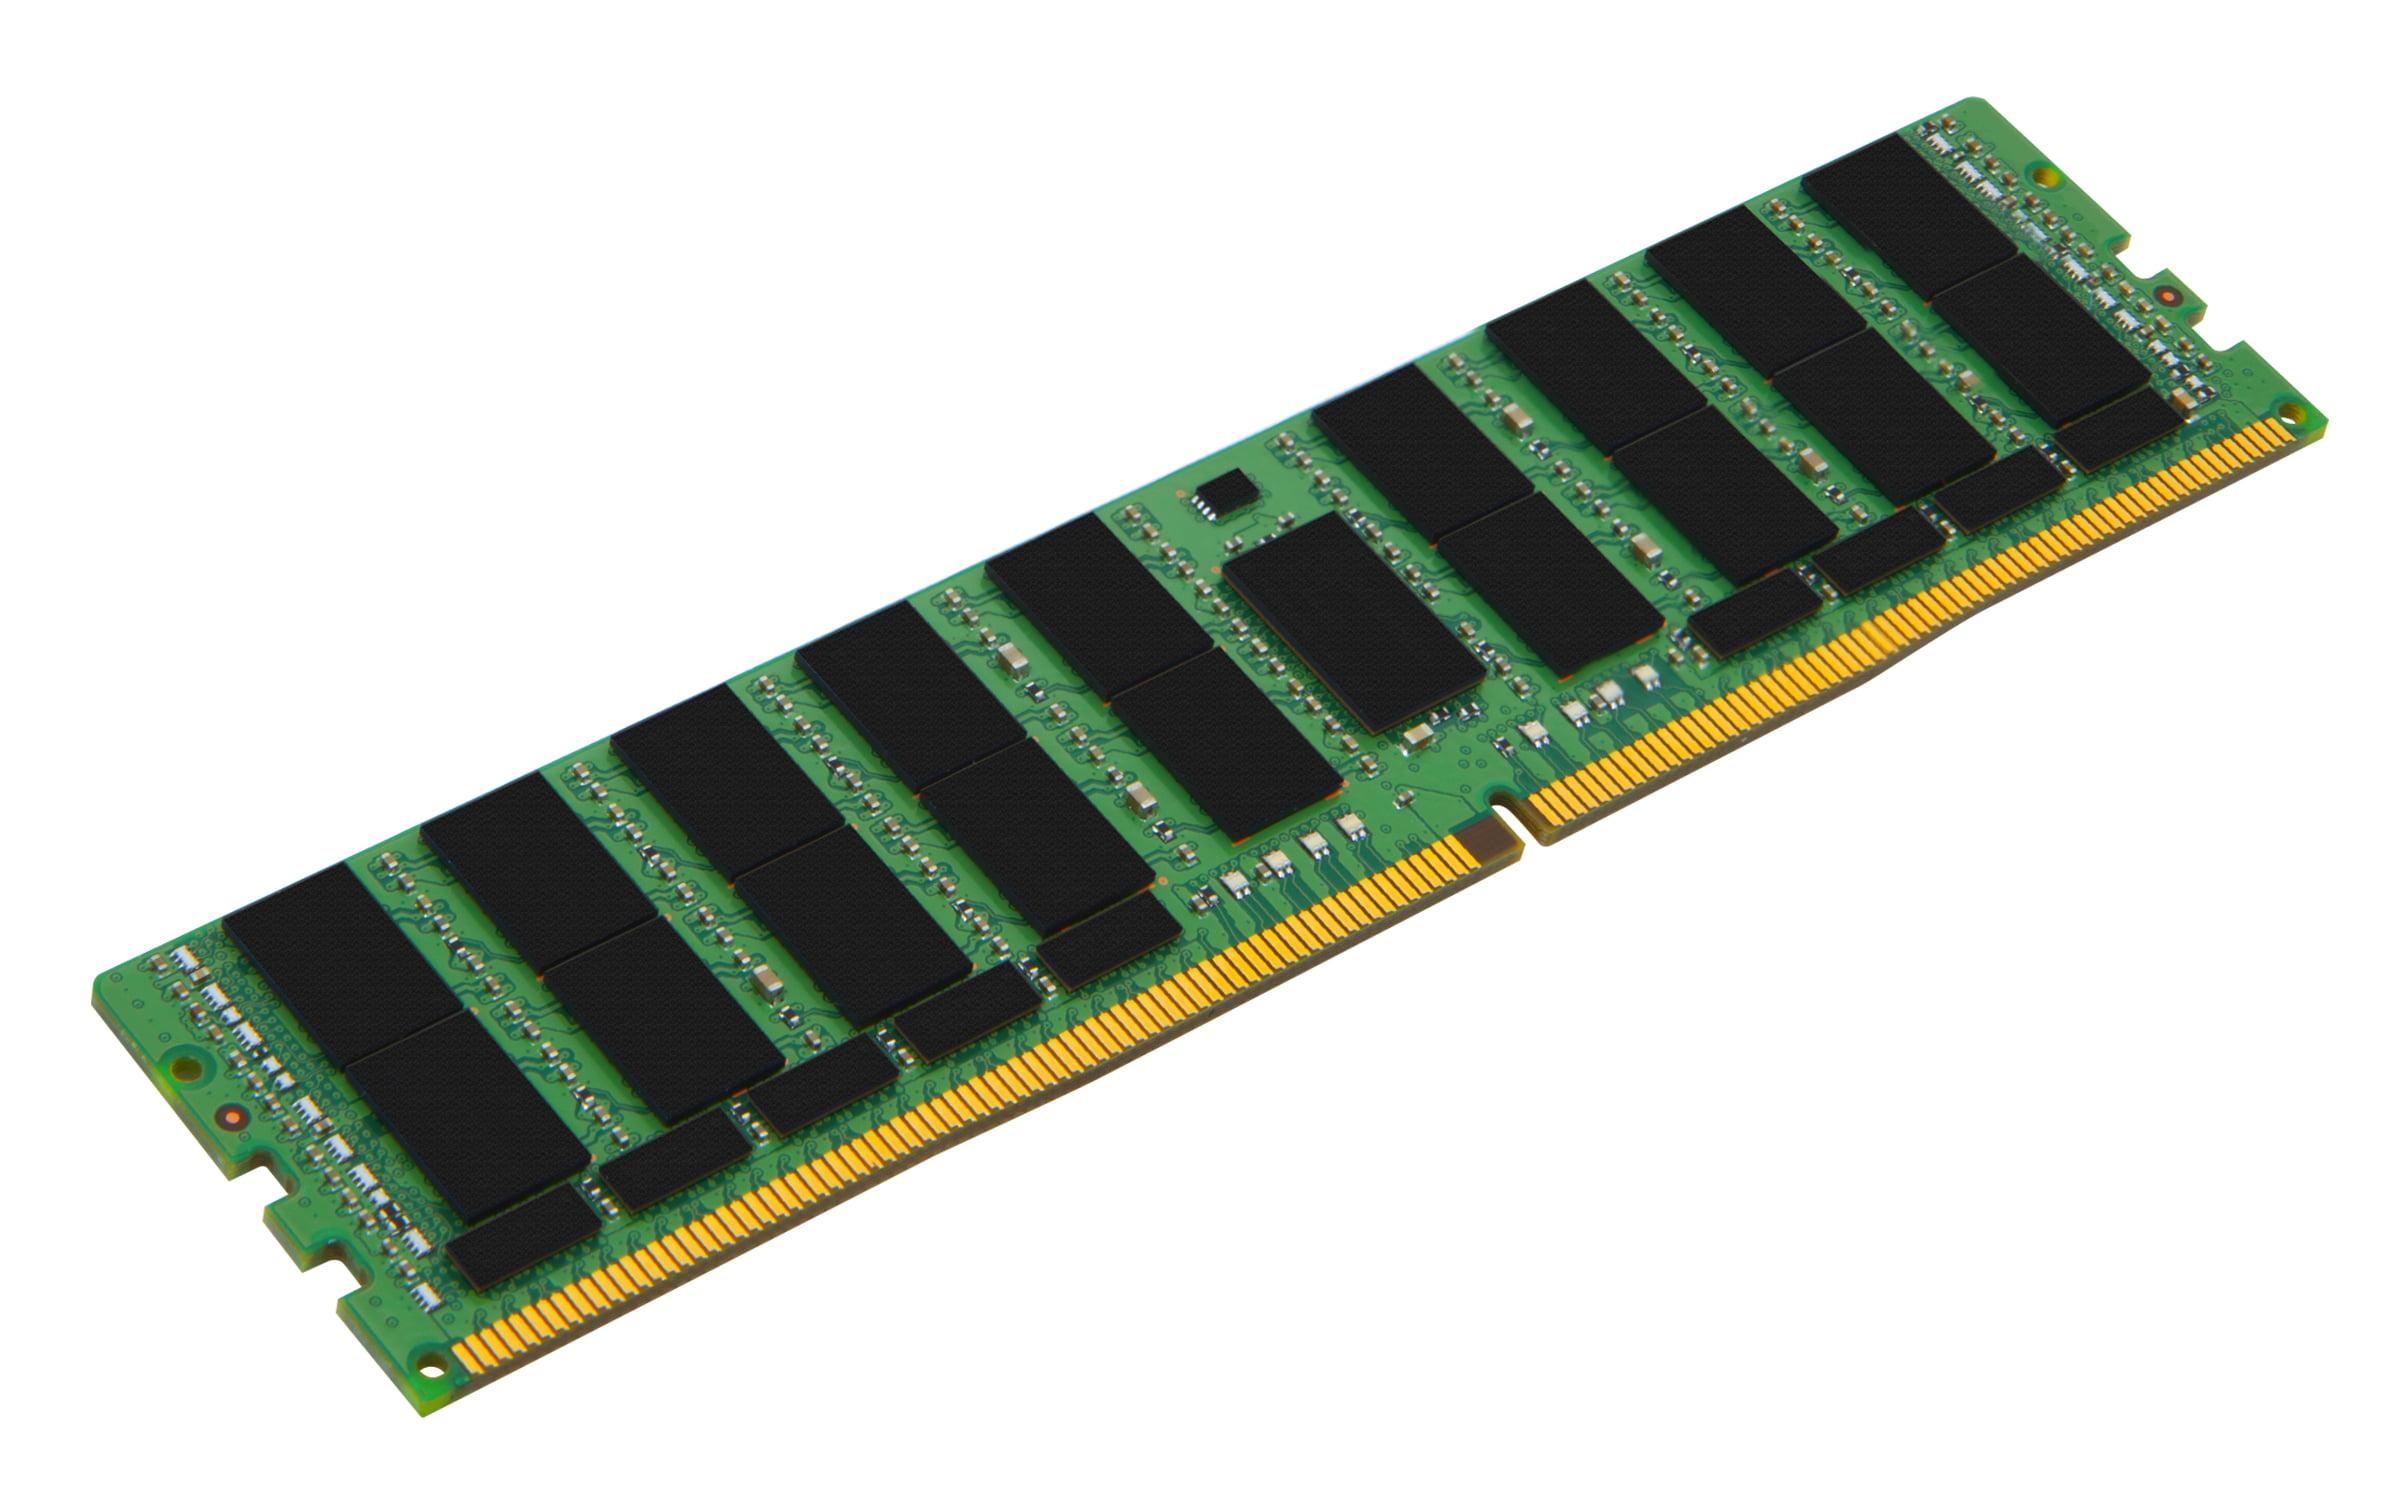 32GB DDR4-2400 Memory RAM Upgrade for The Compaq HP Proliant ML350 G9 Server Memory PC4-19200